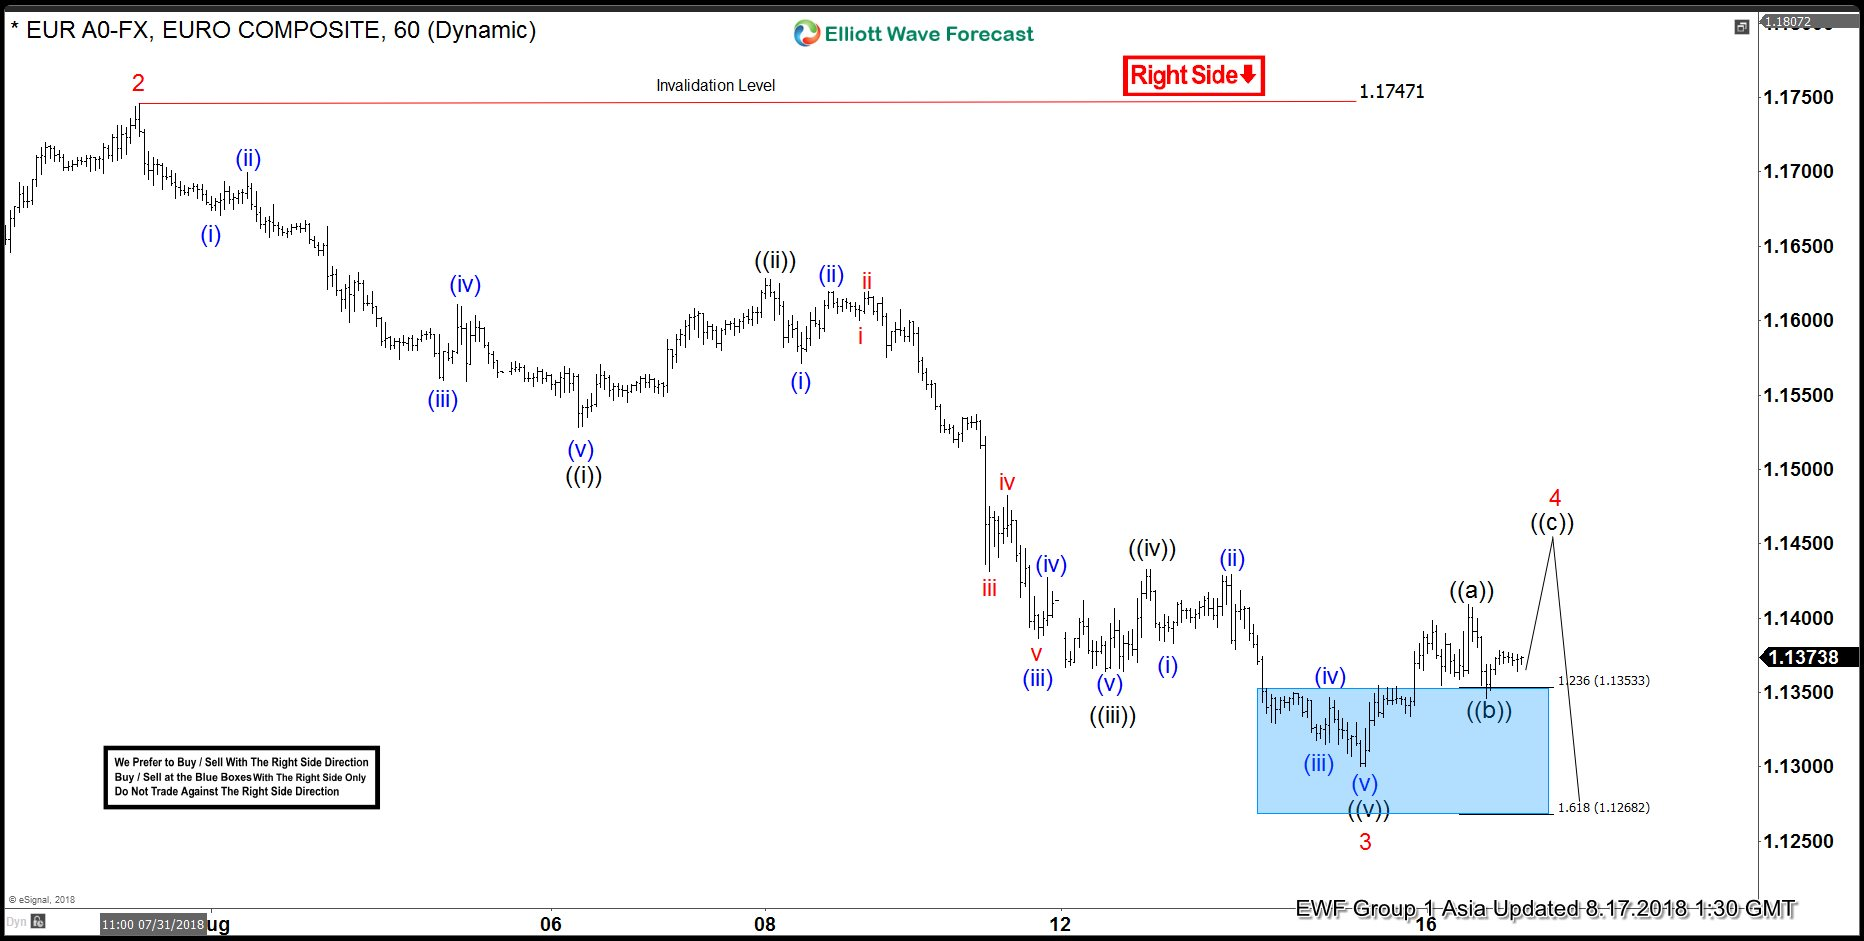 EURUSD Elliott Wave Analysis: More Weakness Expected